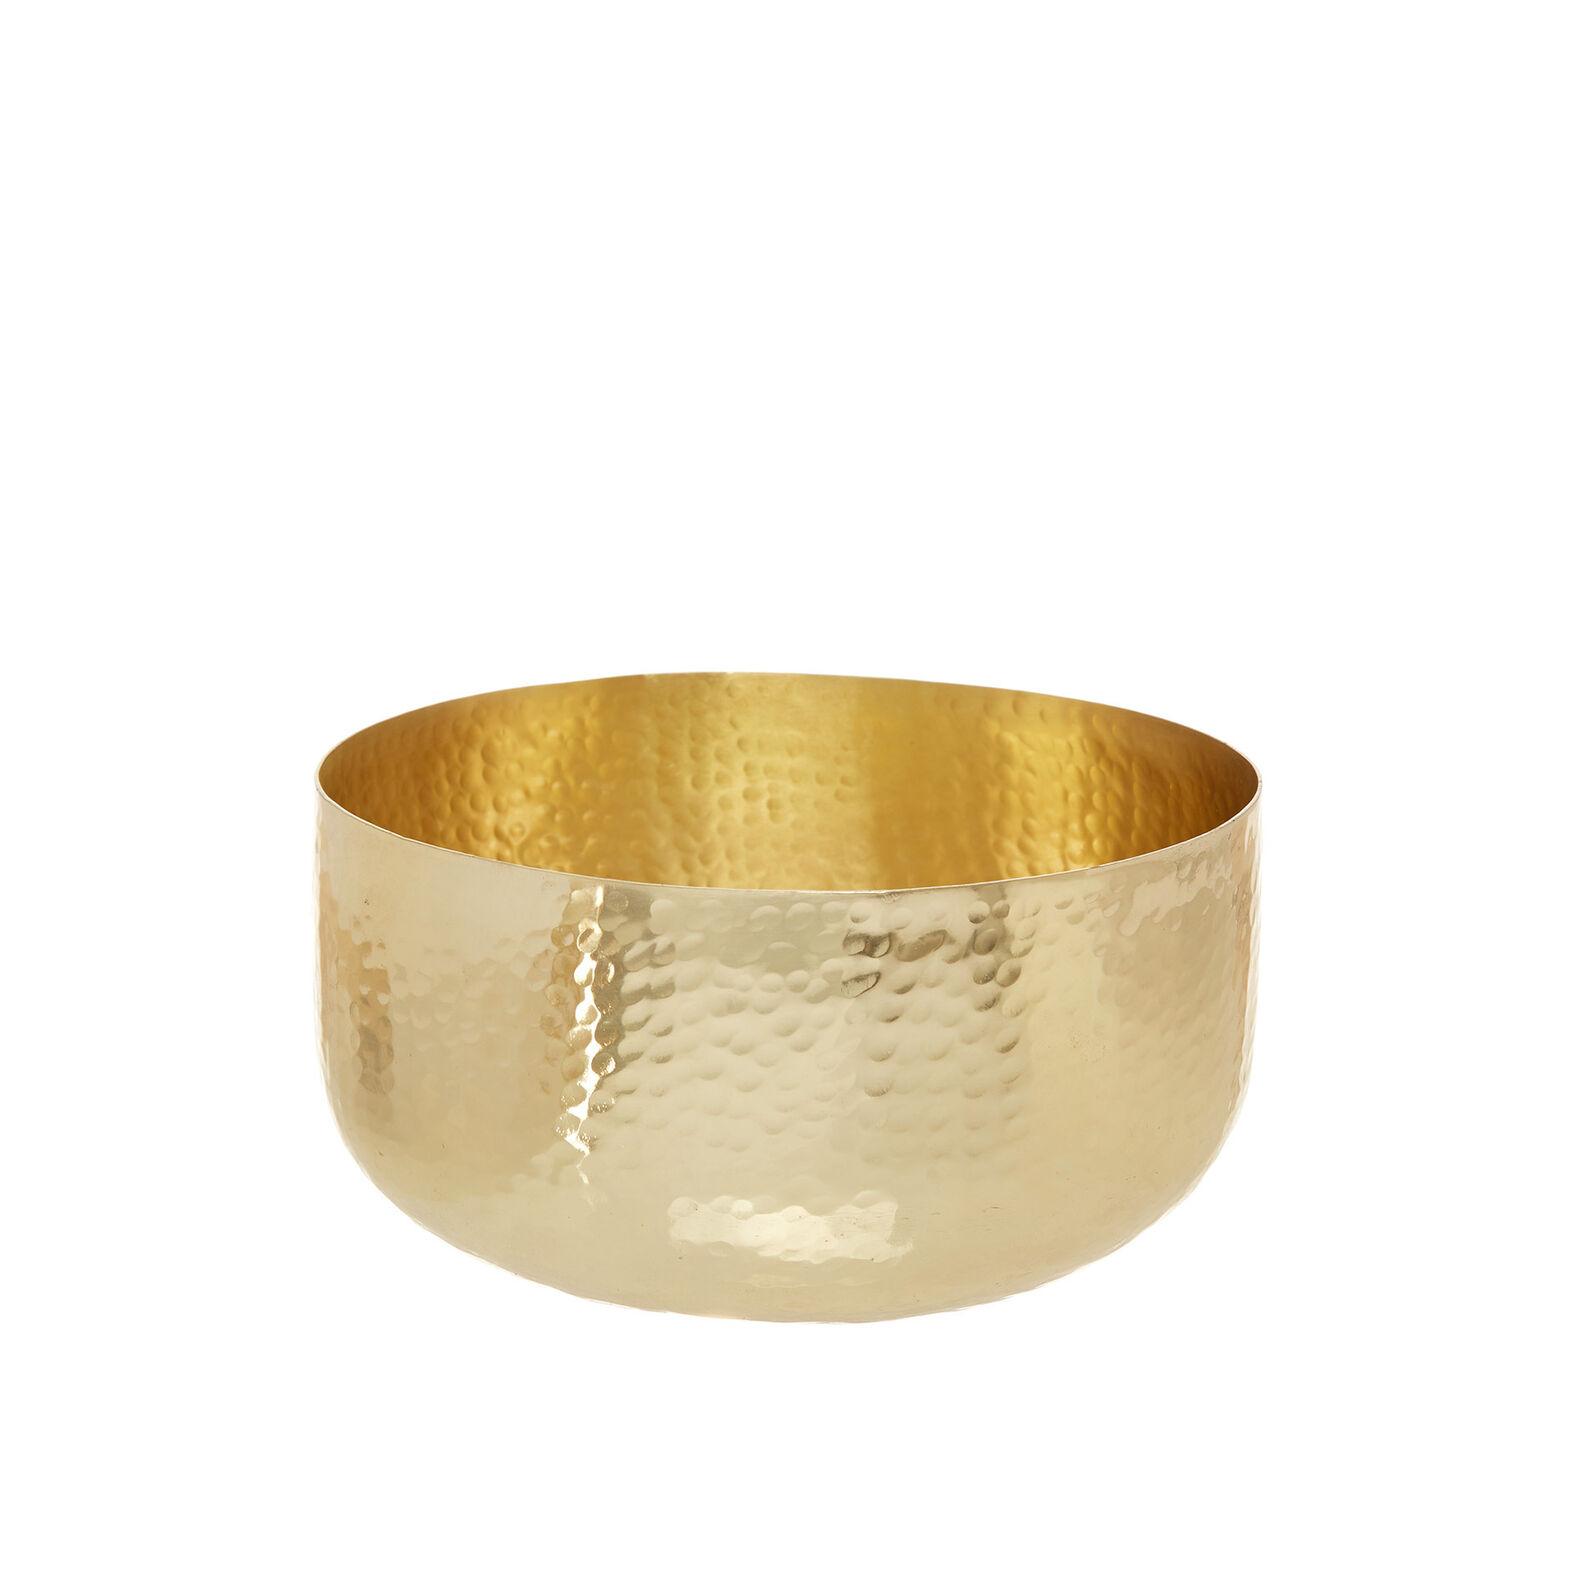 Textured-effect steel bowl